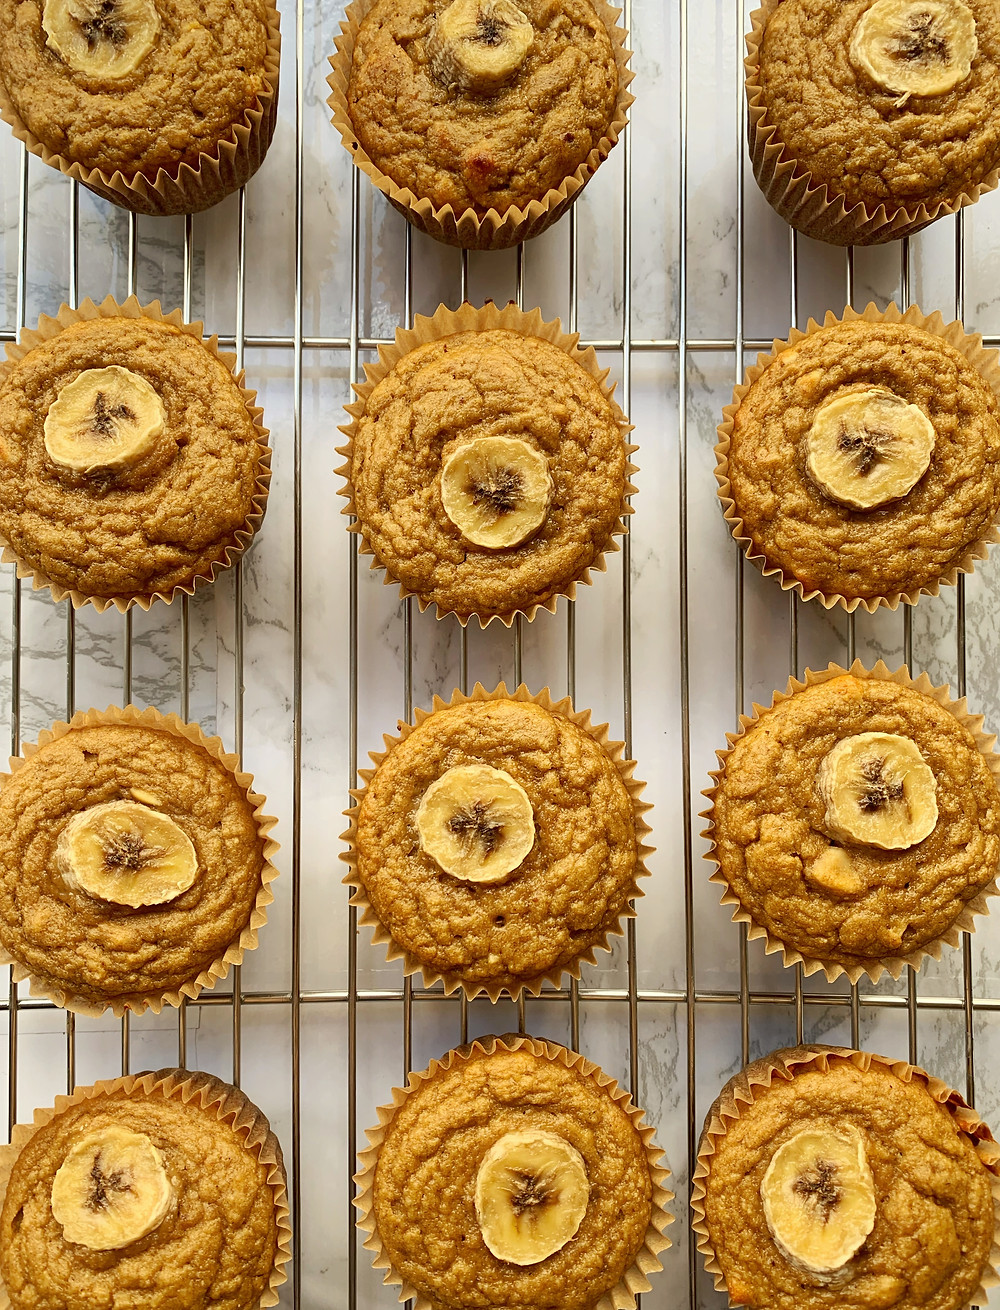 Protein Peanut Butter Banana Muffins